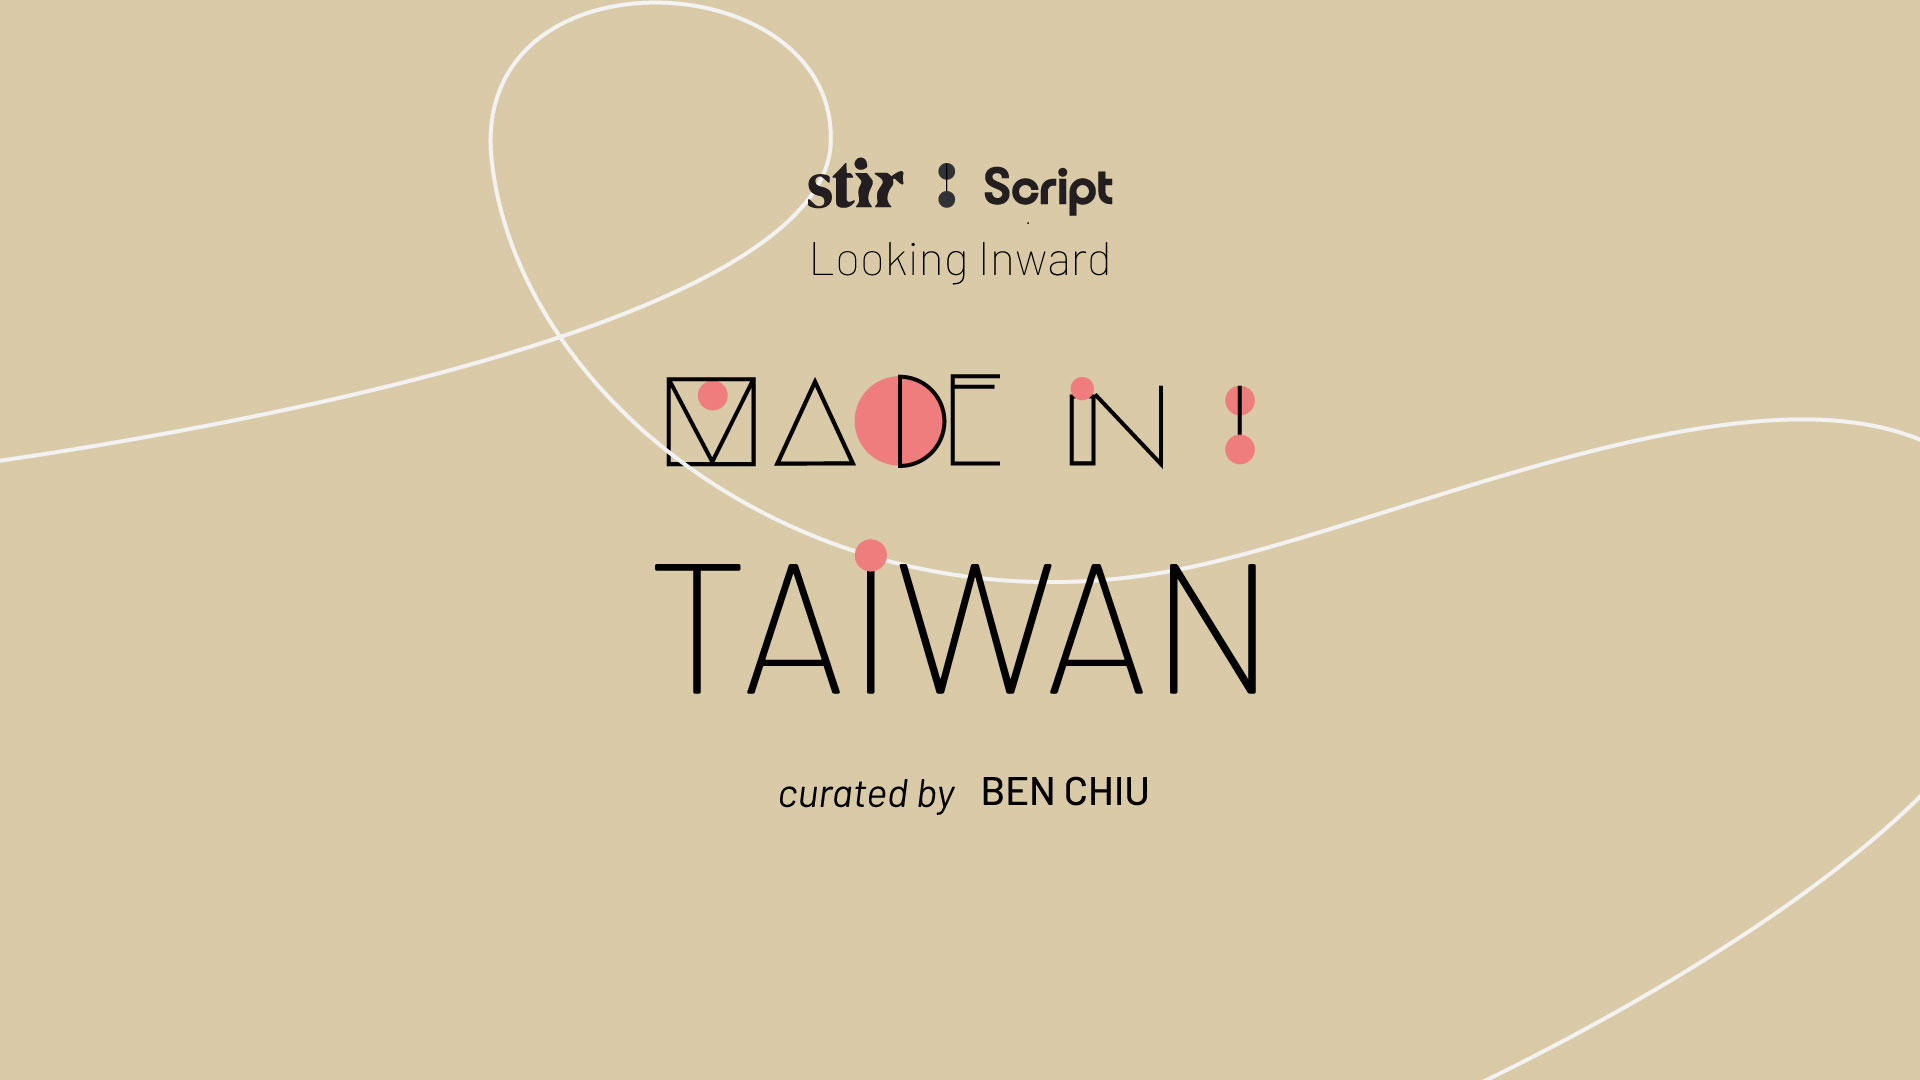 Made in Taiwan: Curated by Ben Chiu | STIRworld